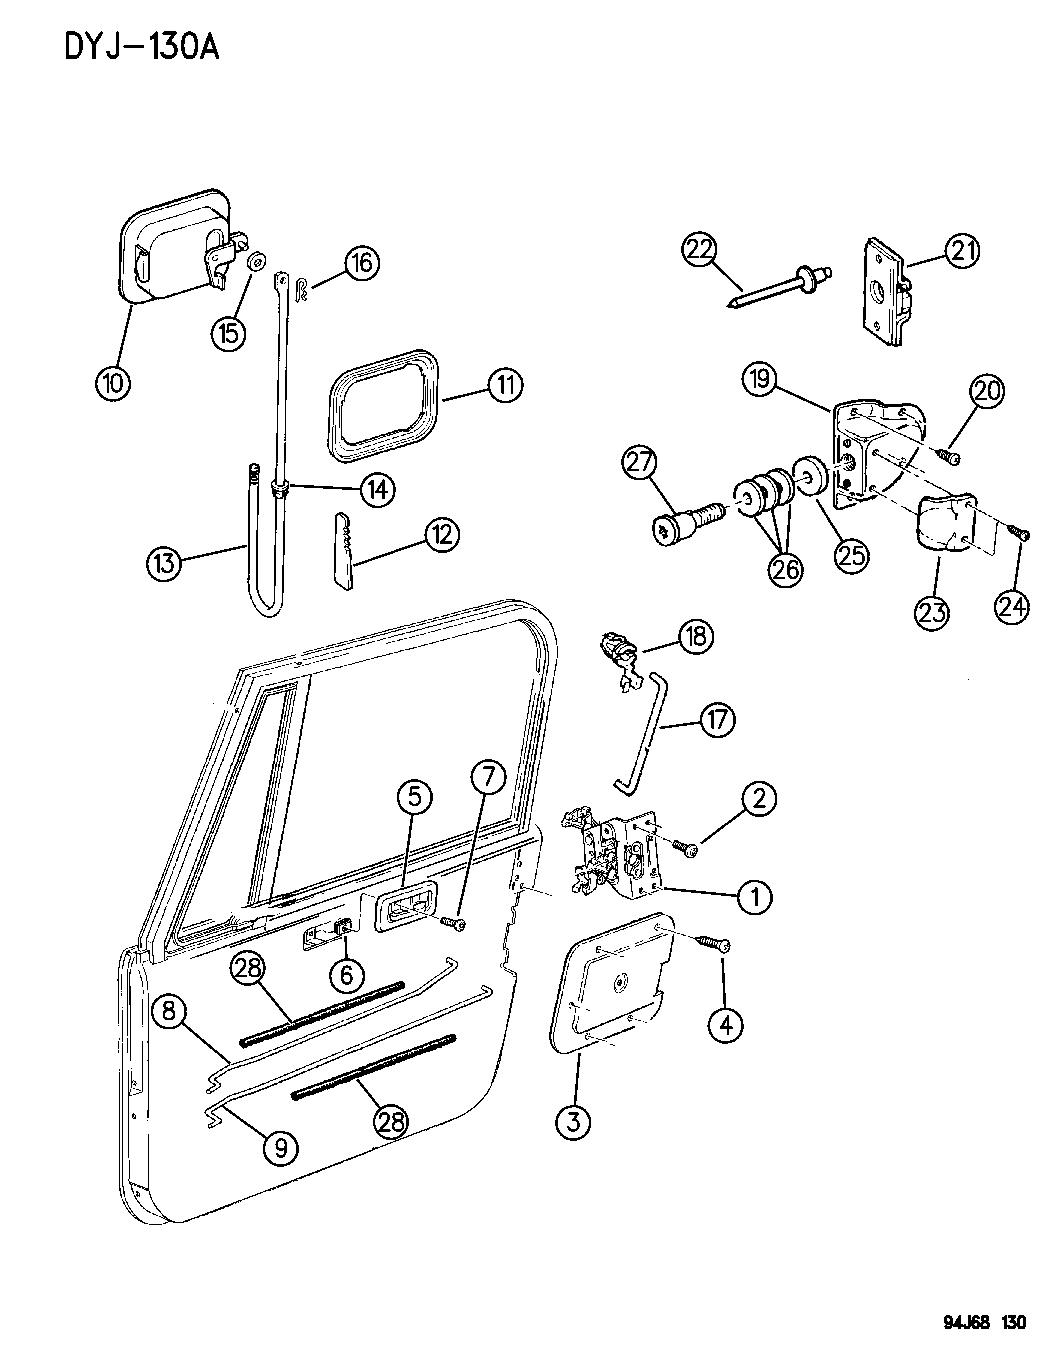 1995 Jeep Wrangler Door, Front, Full Lock And Controls